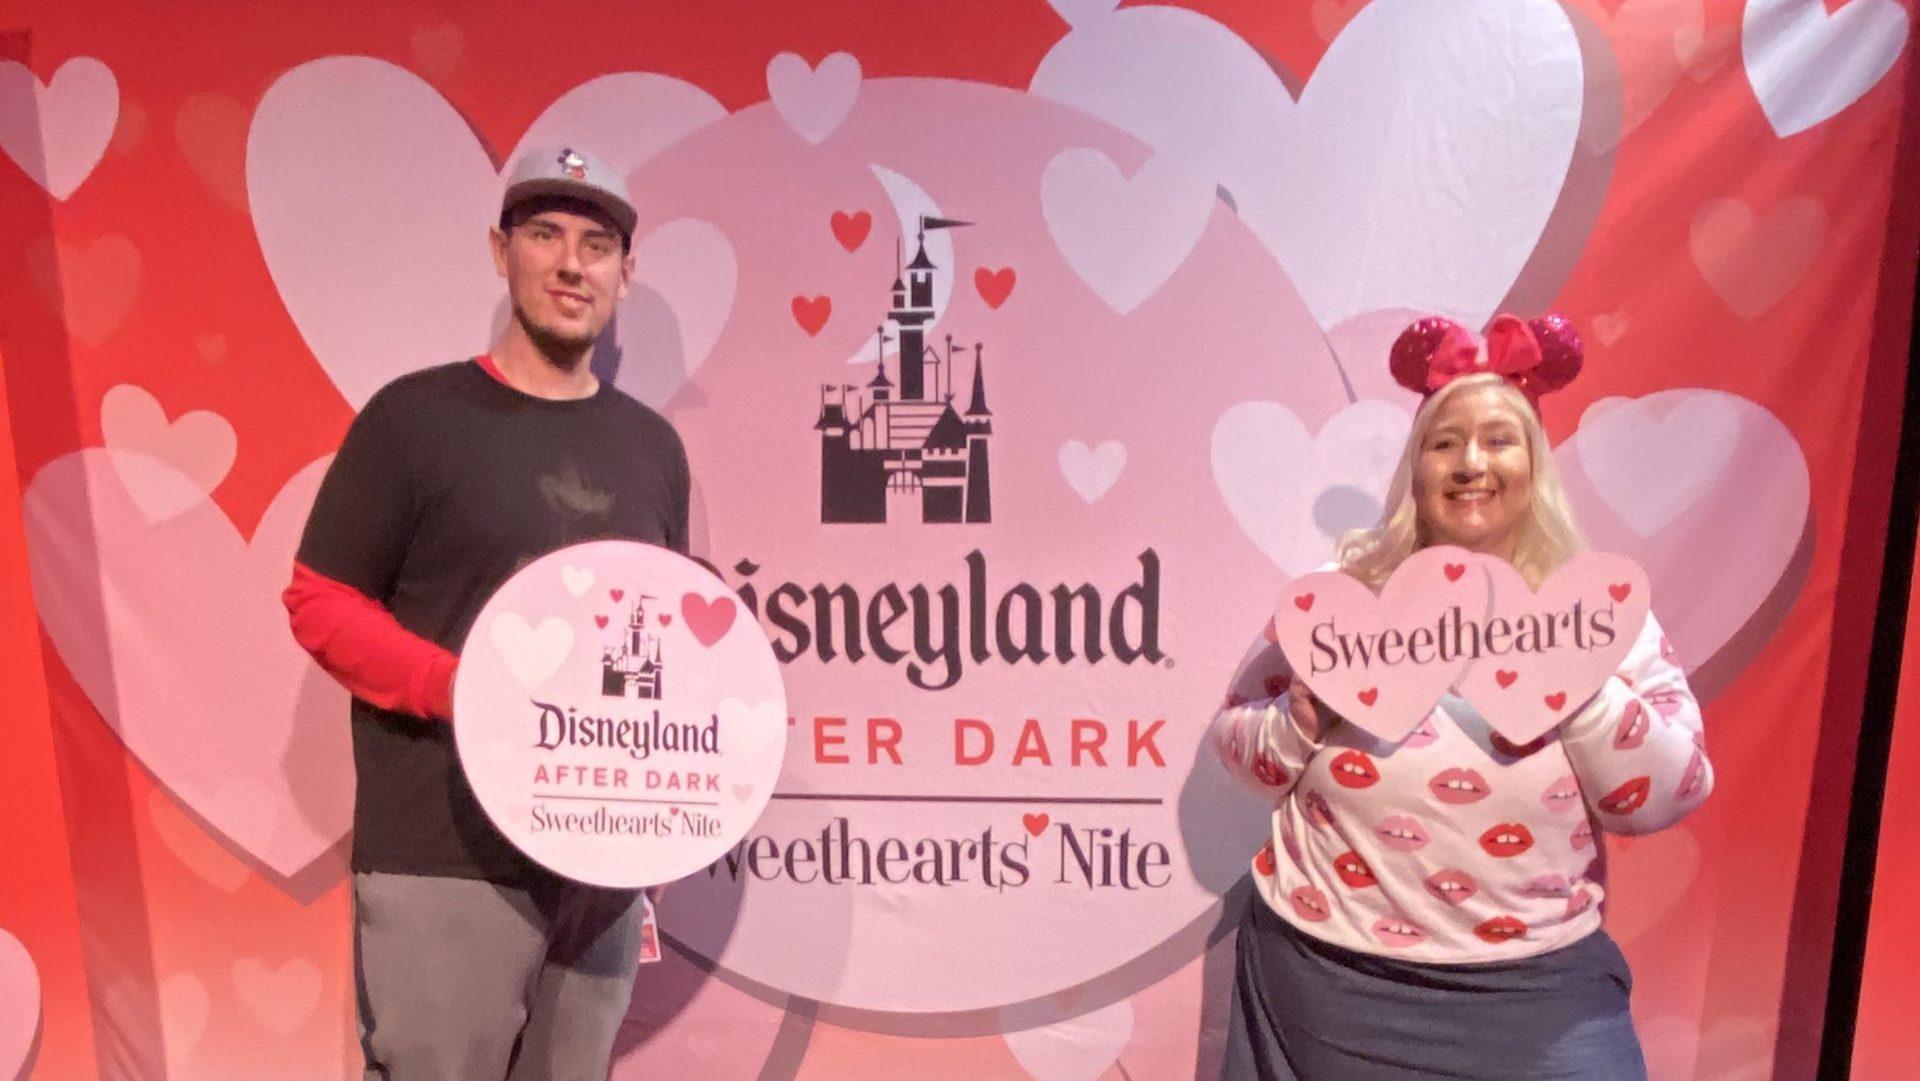 Disneyland After Dark Sweethearts Nite